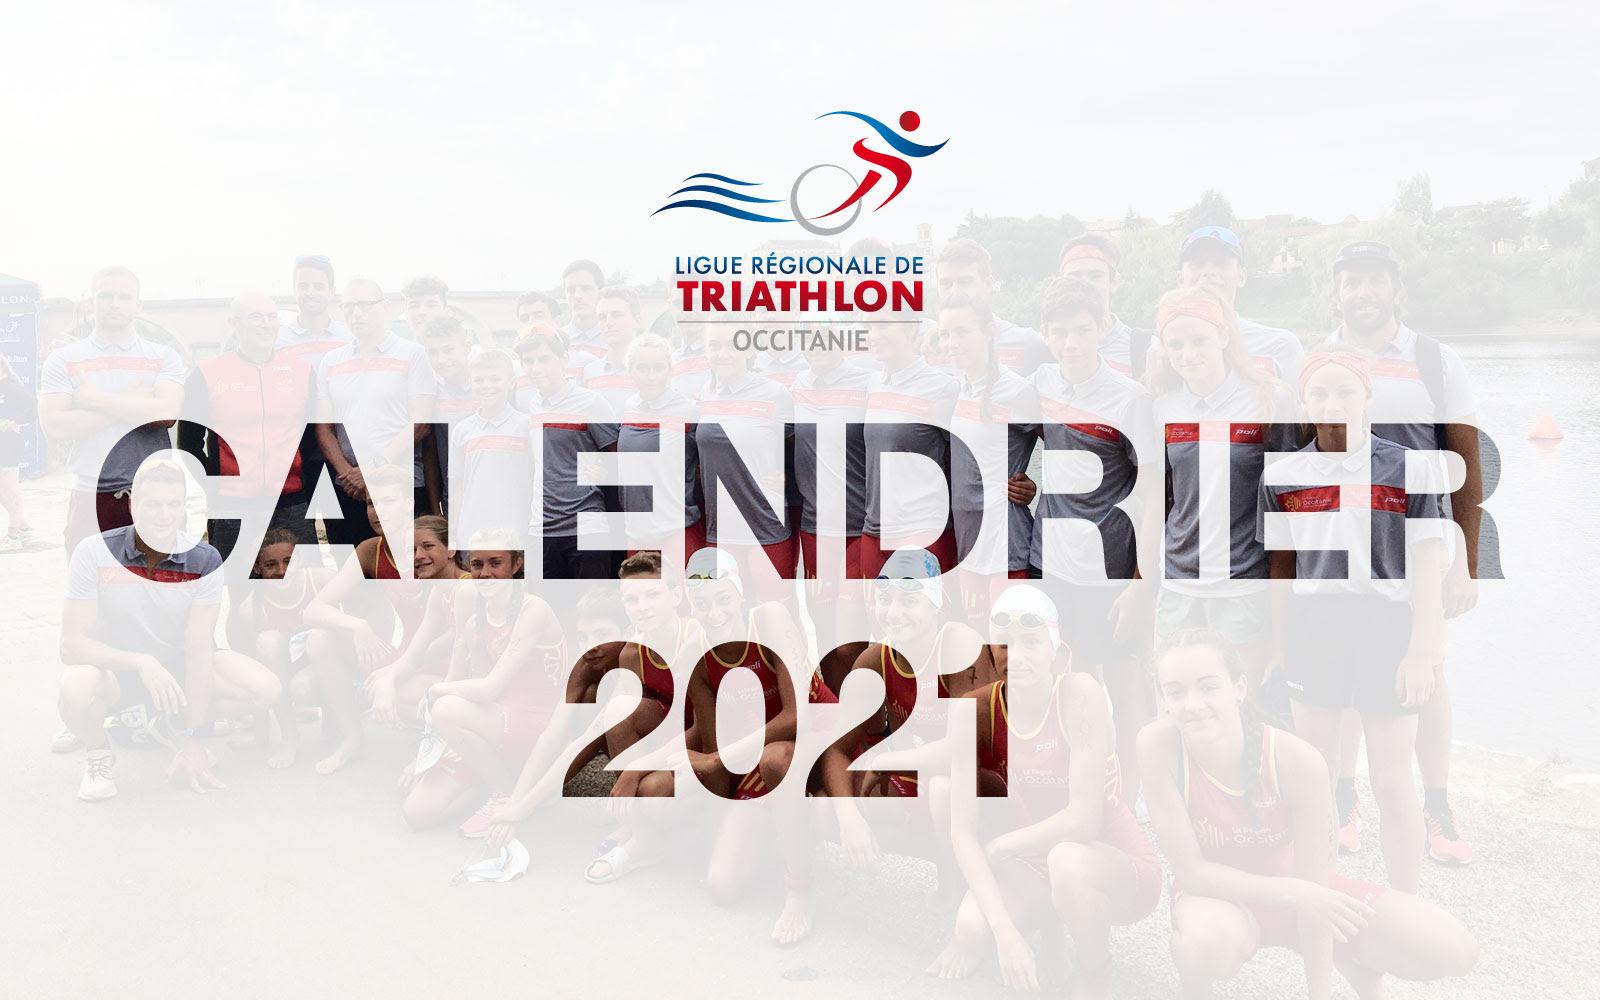 Triathlon Calendrier 2022 Calendrier may 2021: Triathlon Calendrier 2021